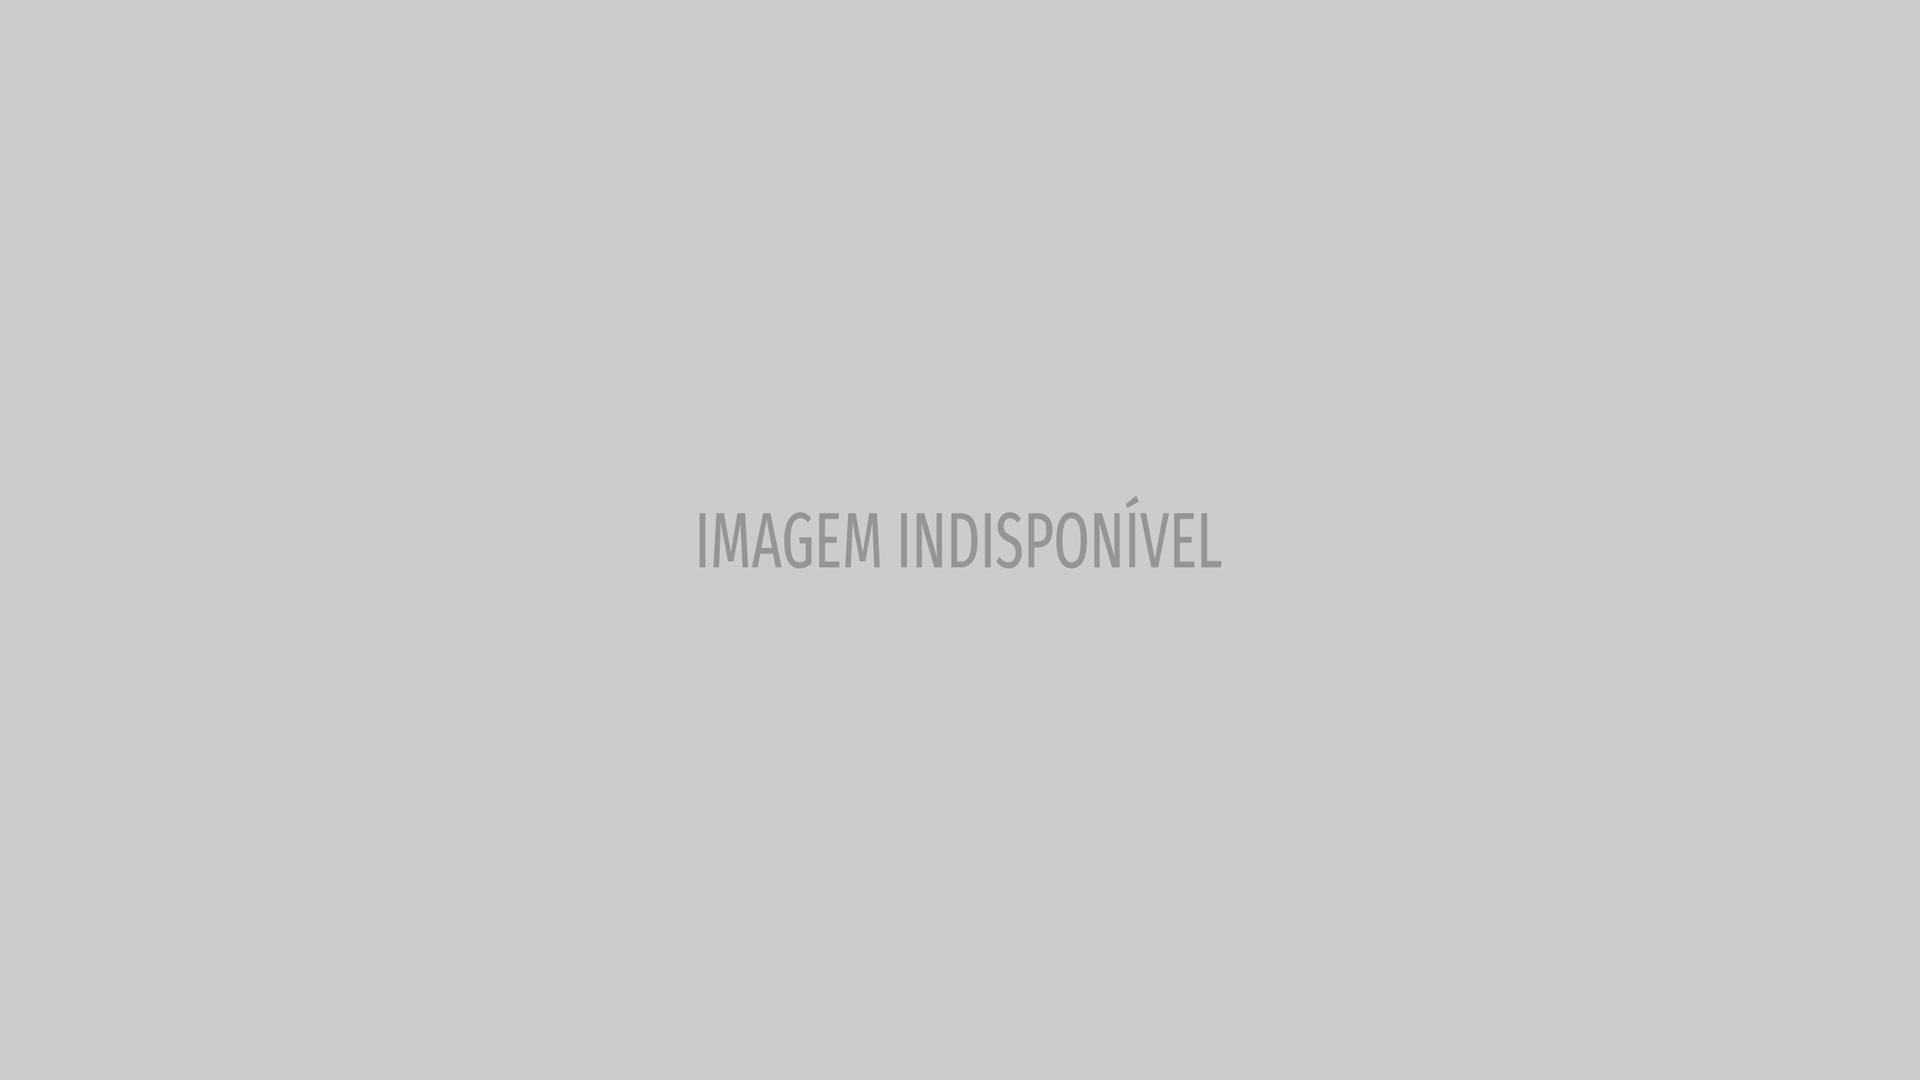 Juliana Paes exibe curvas em piscina de borda infinita nas Maldivas